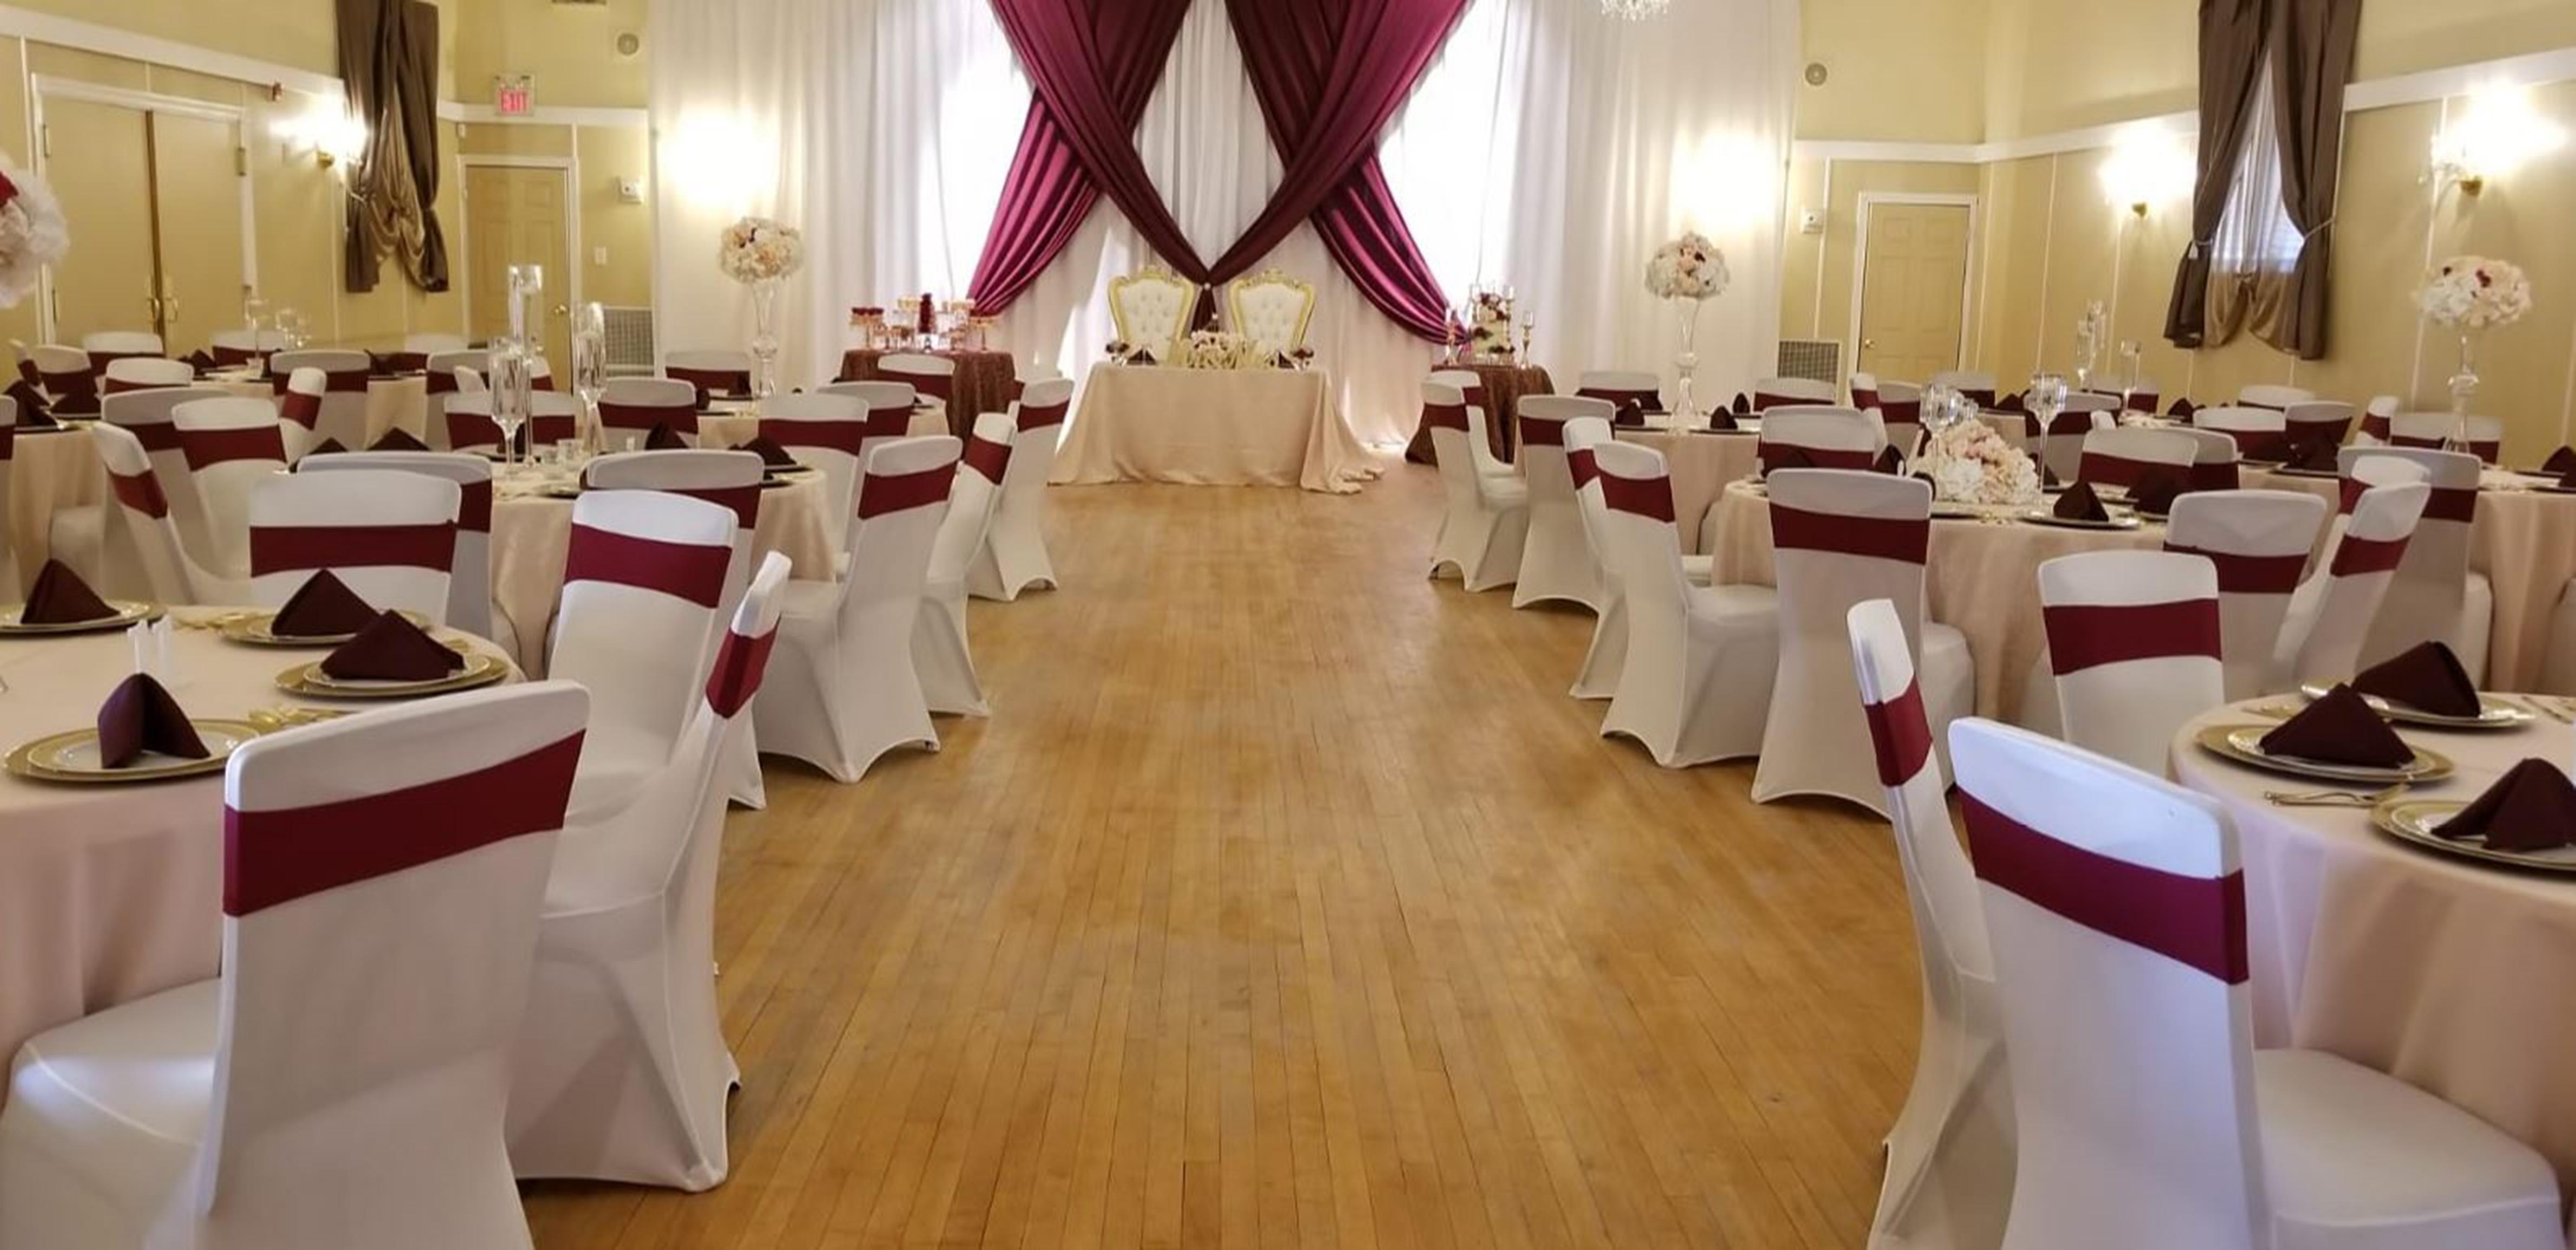 Banquet Hall Rentals Associated Polish Home Dom Polski